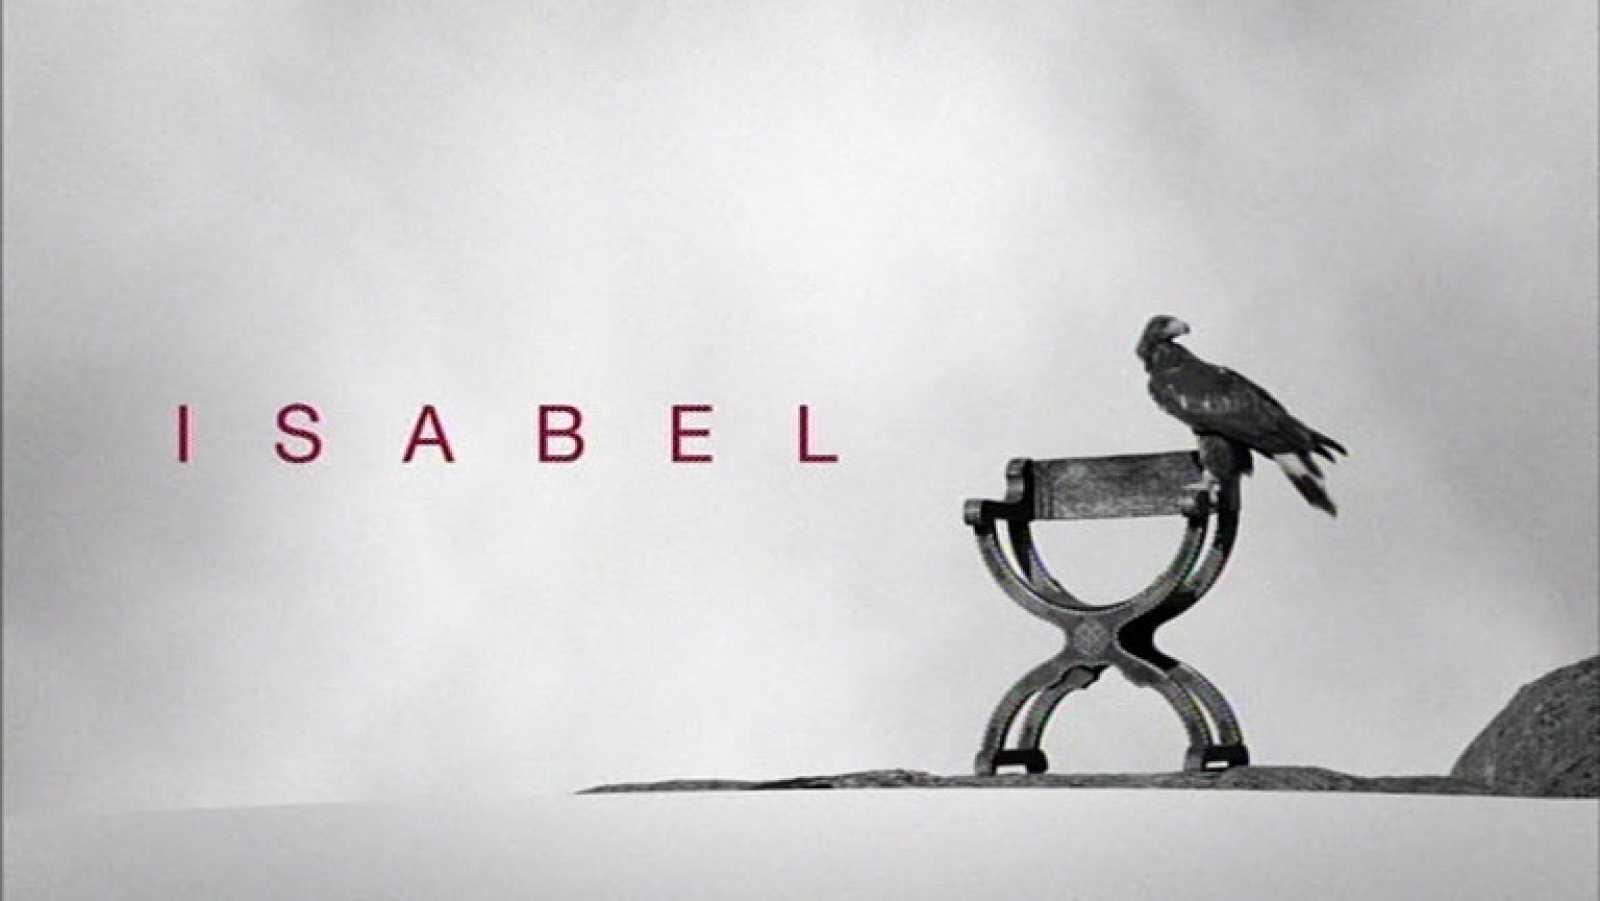 Isabel - cabecera de la serie - ver vídeo